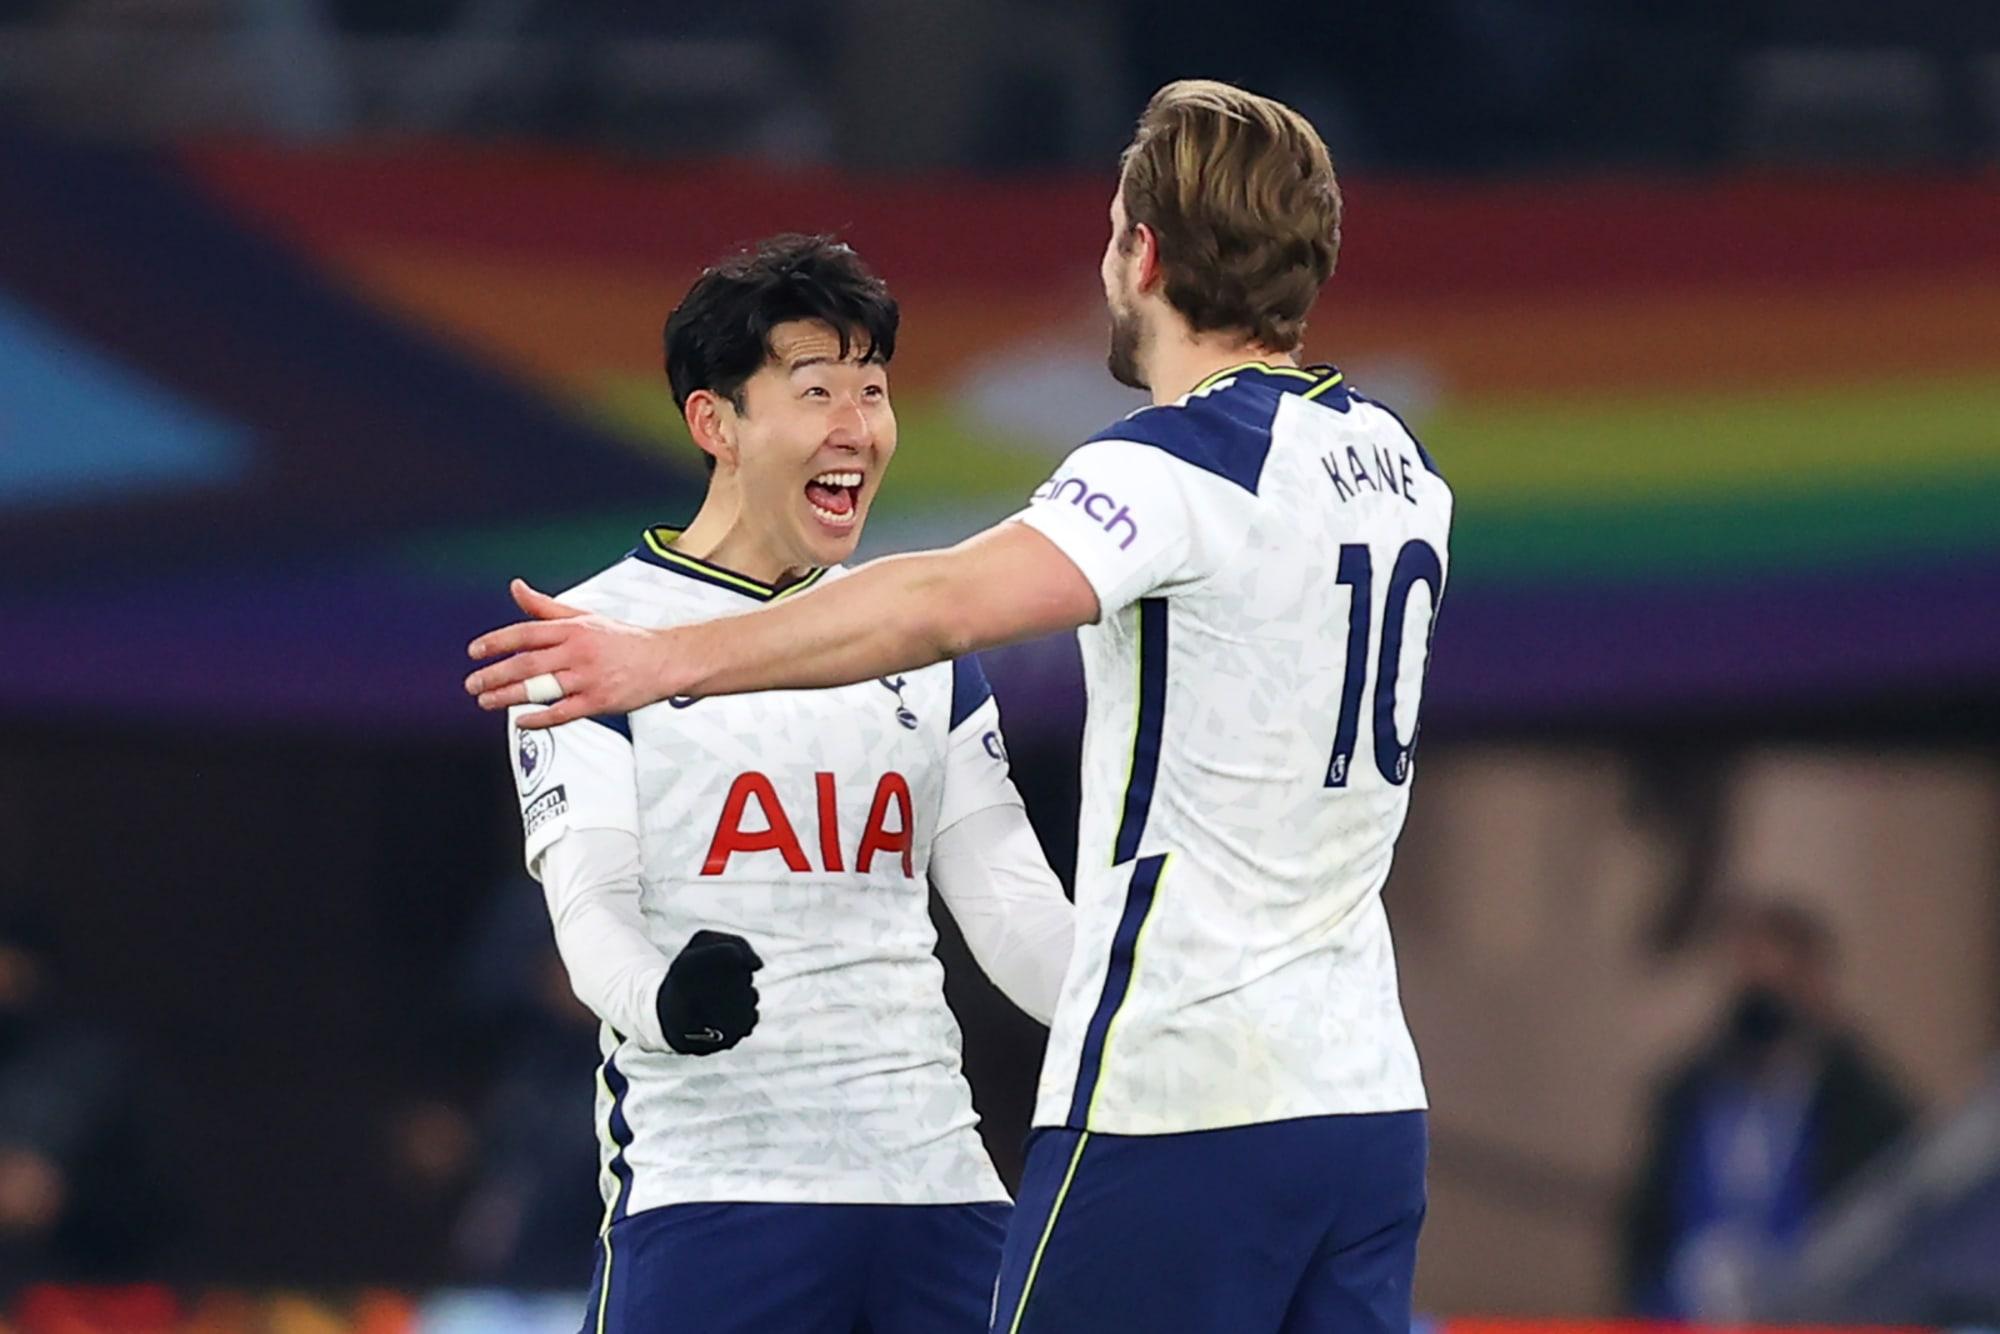 Tottenham star forwards Harry Kane and Son Heung-min celebrating a goal